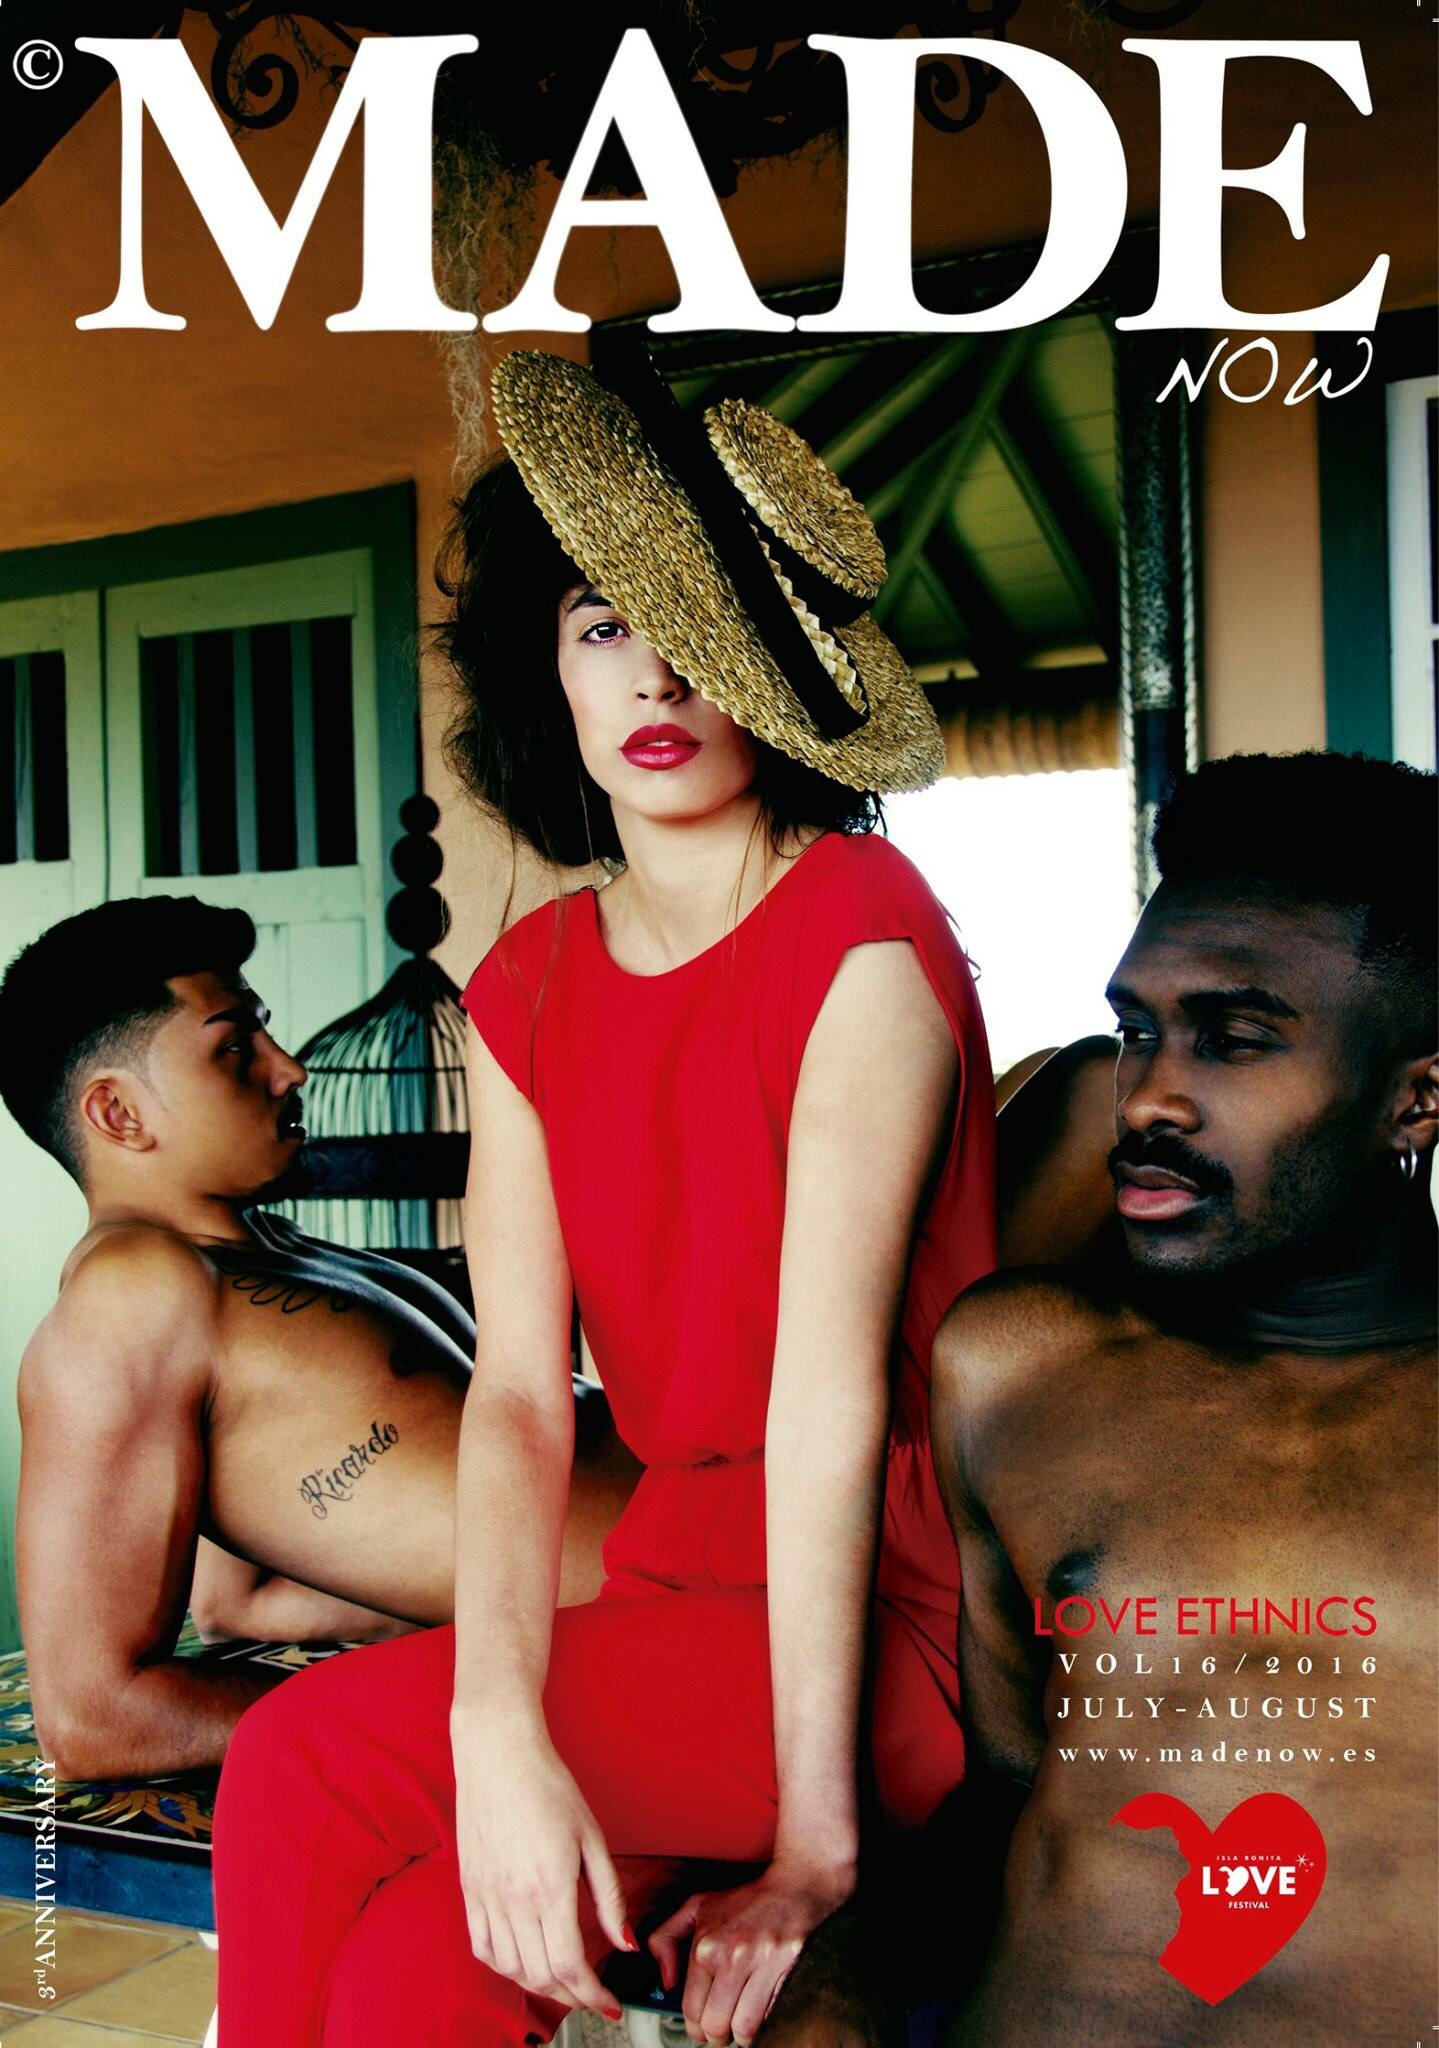 Made Now Magazine - at the Isla Bonita Love festival.